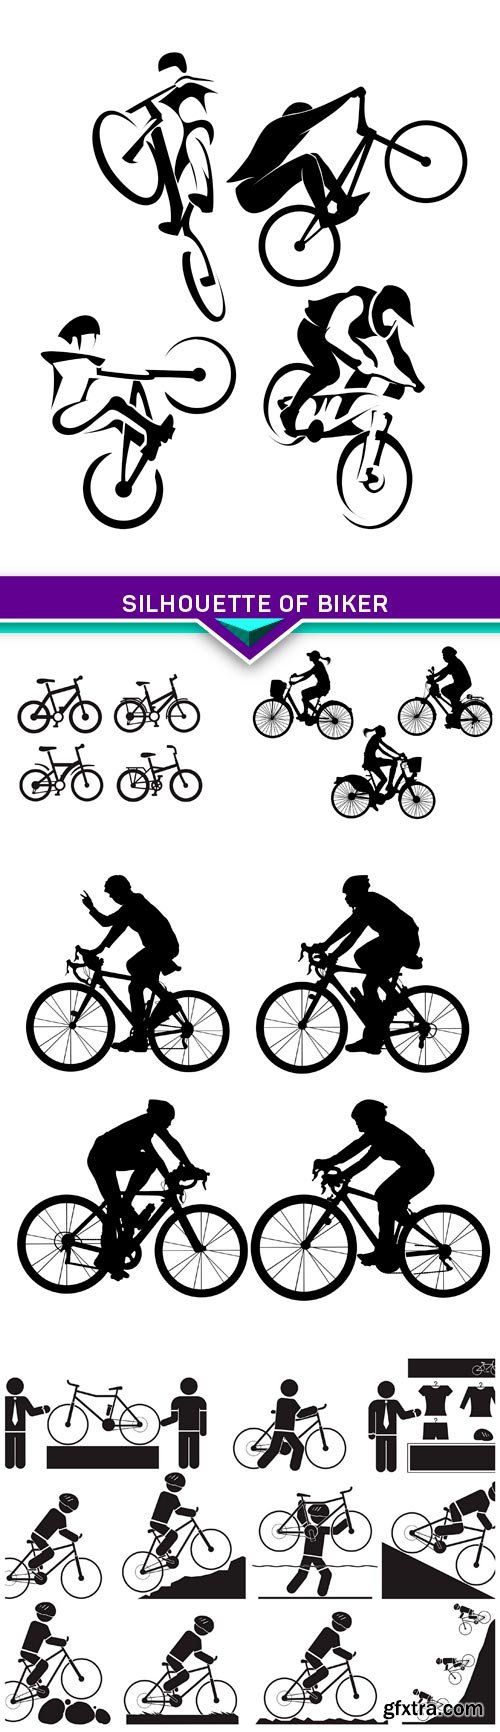 Silhouette of Biker 5X EPS